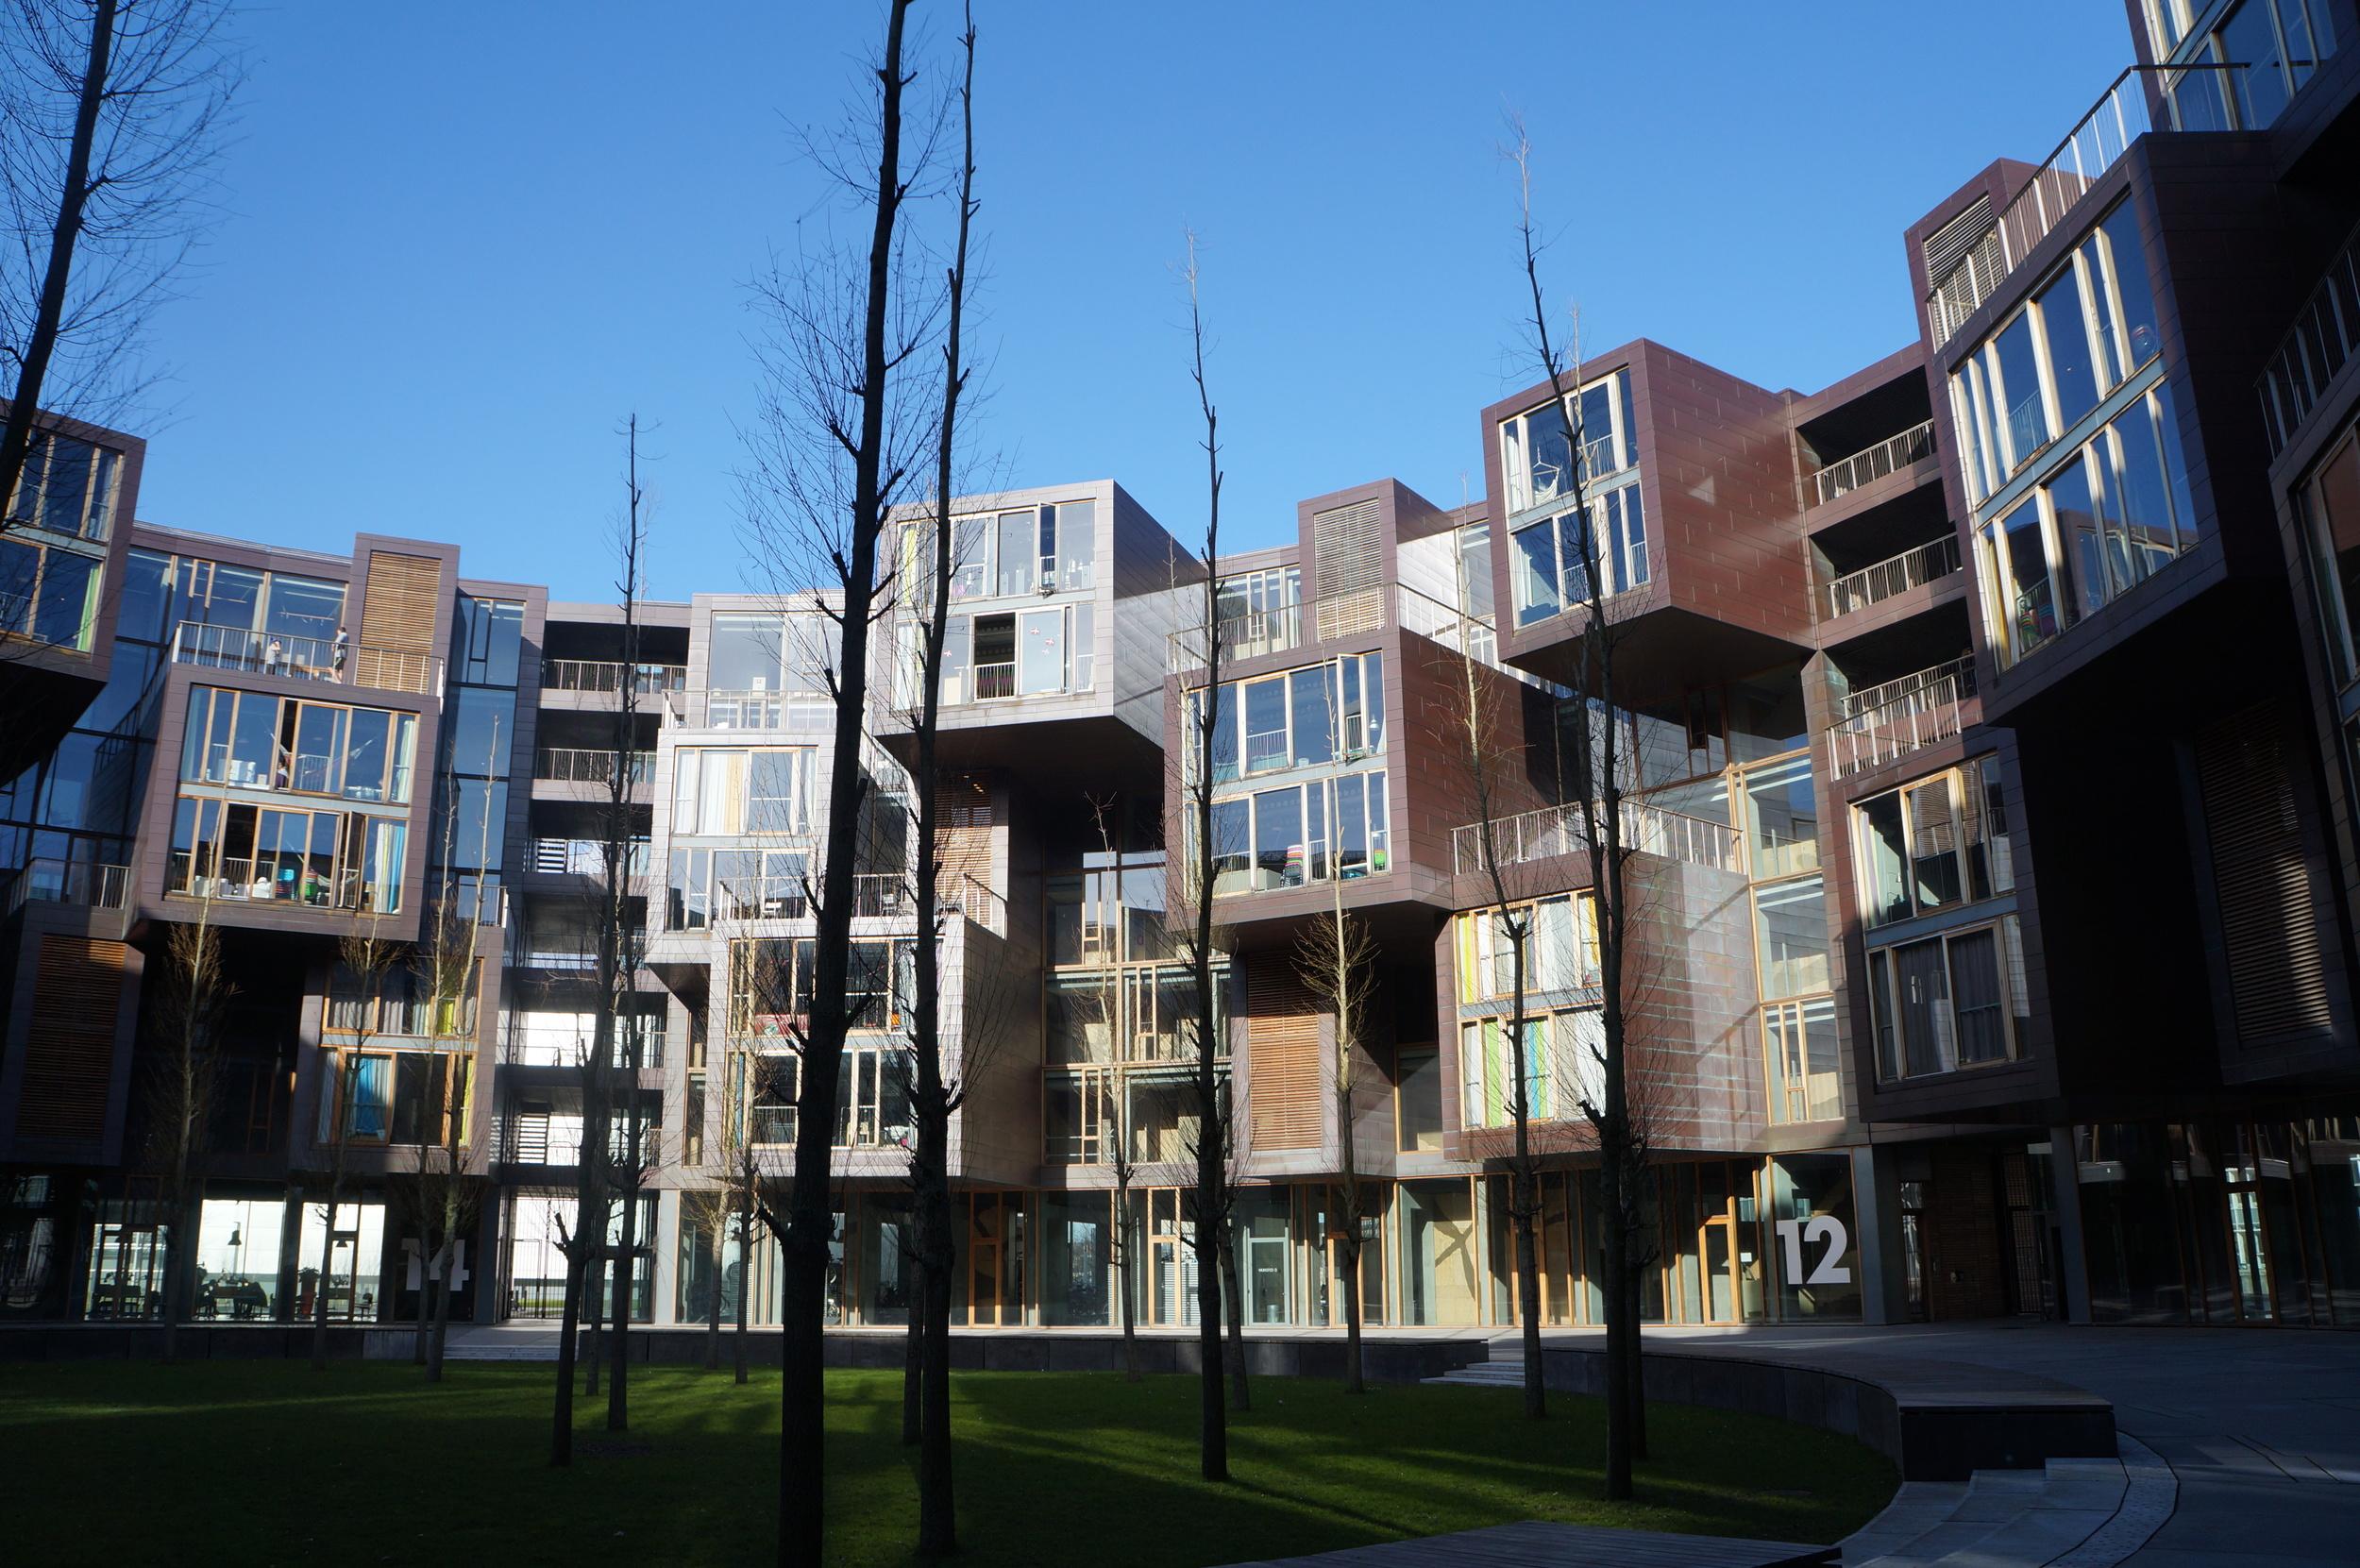 Tietgen Dormitory, Lundgaard og Tranberg. Photo: Experience Ørestad